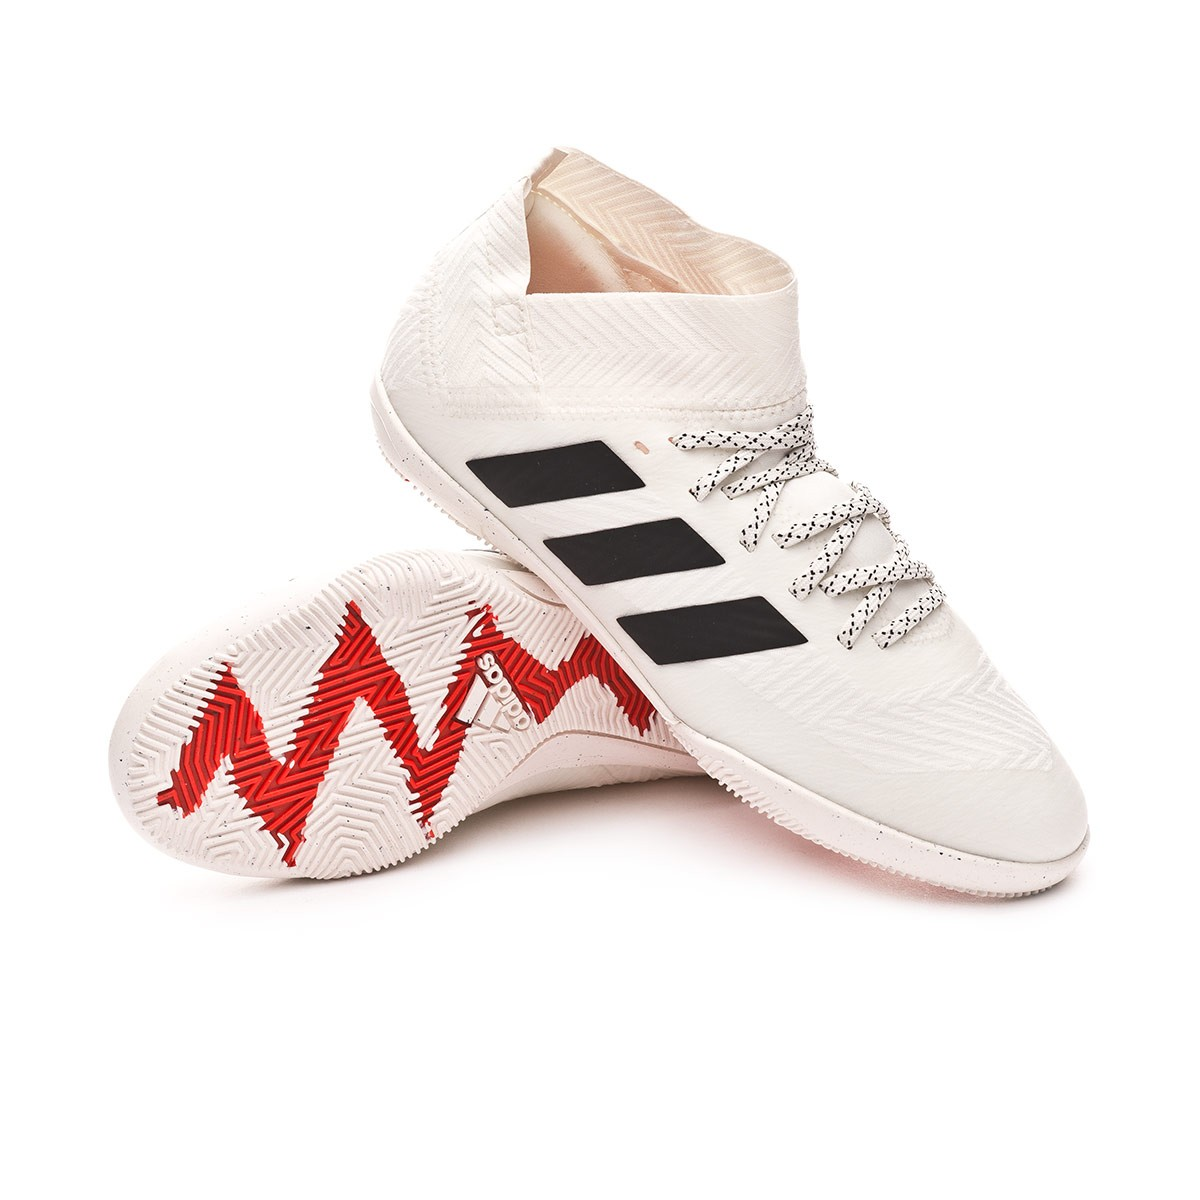 Chuteira Society Infantil Adidas Nemeziz Messi 18 4 TF | São